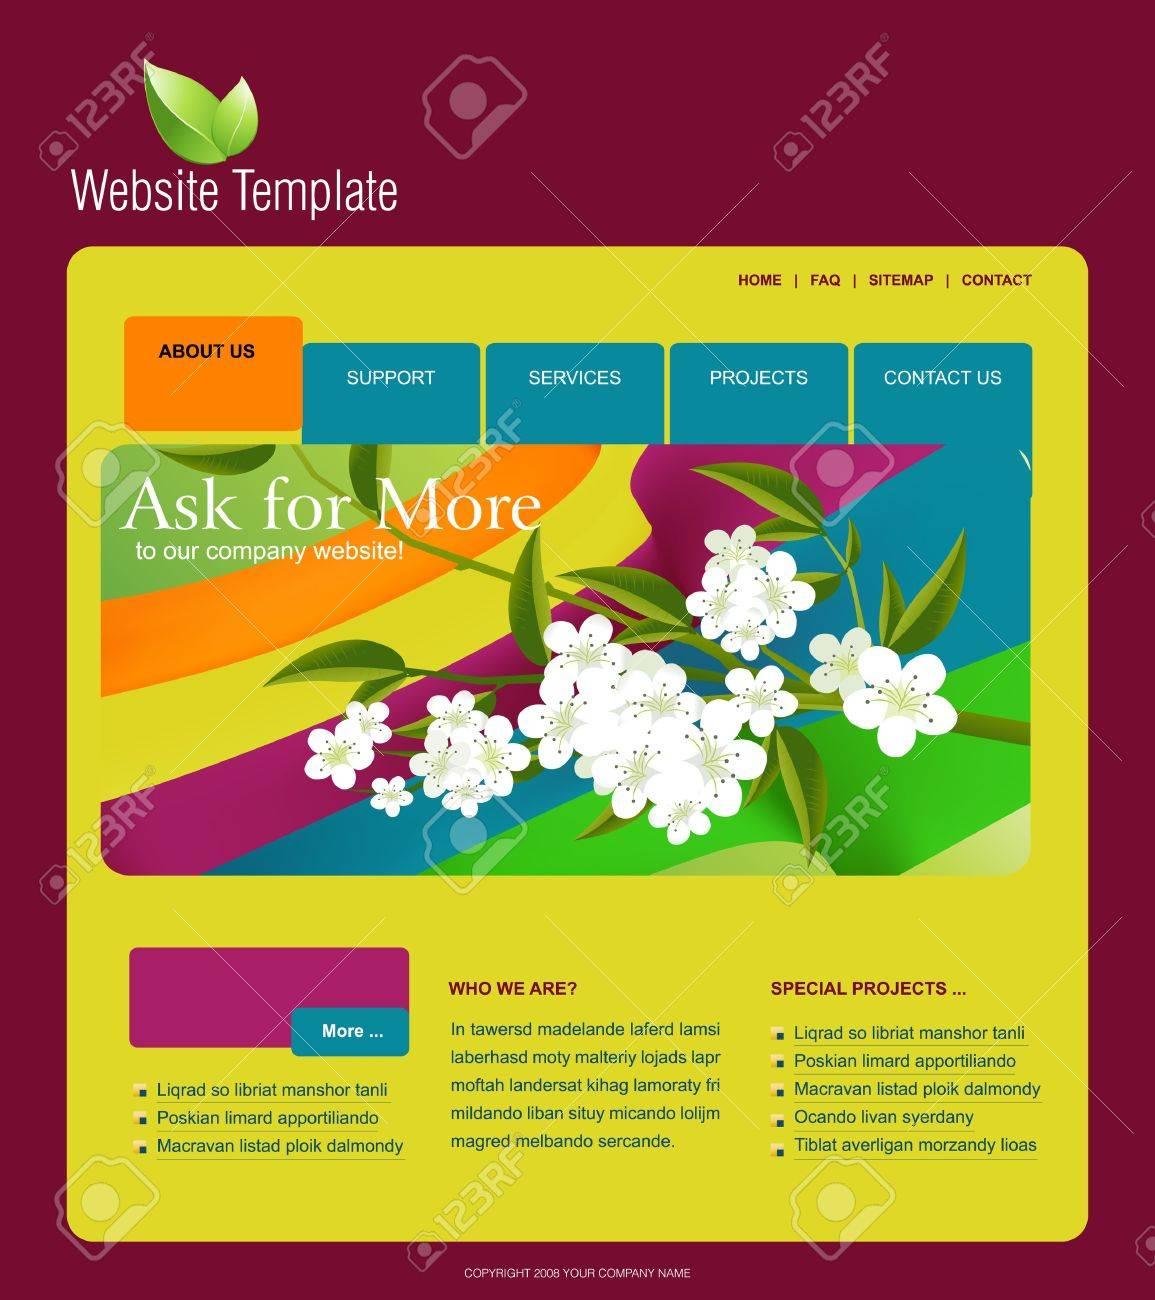 Plantilla De Sitio Web, Fácil De Usar En Adobe Photoshop, Flash O ...